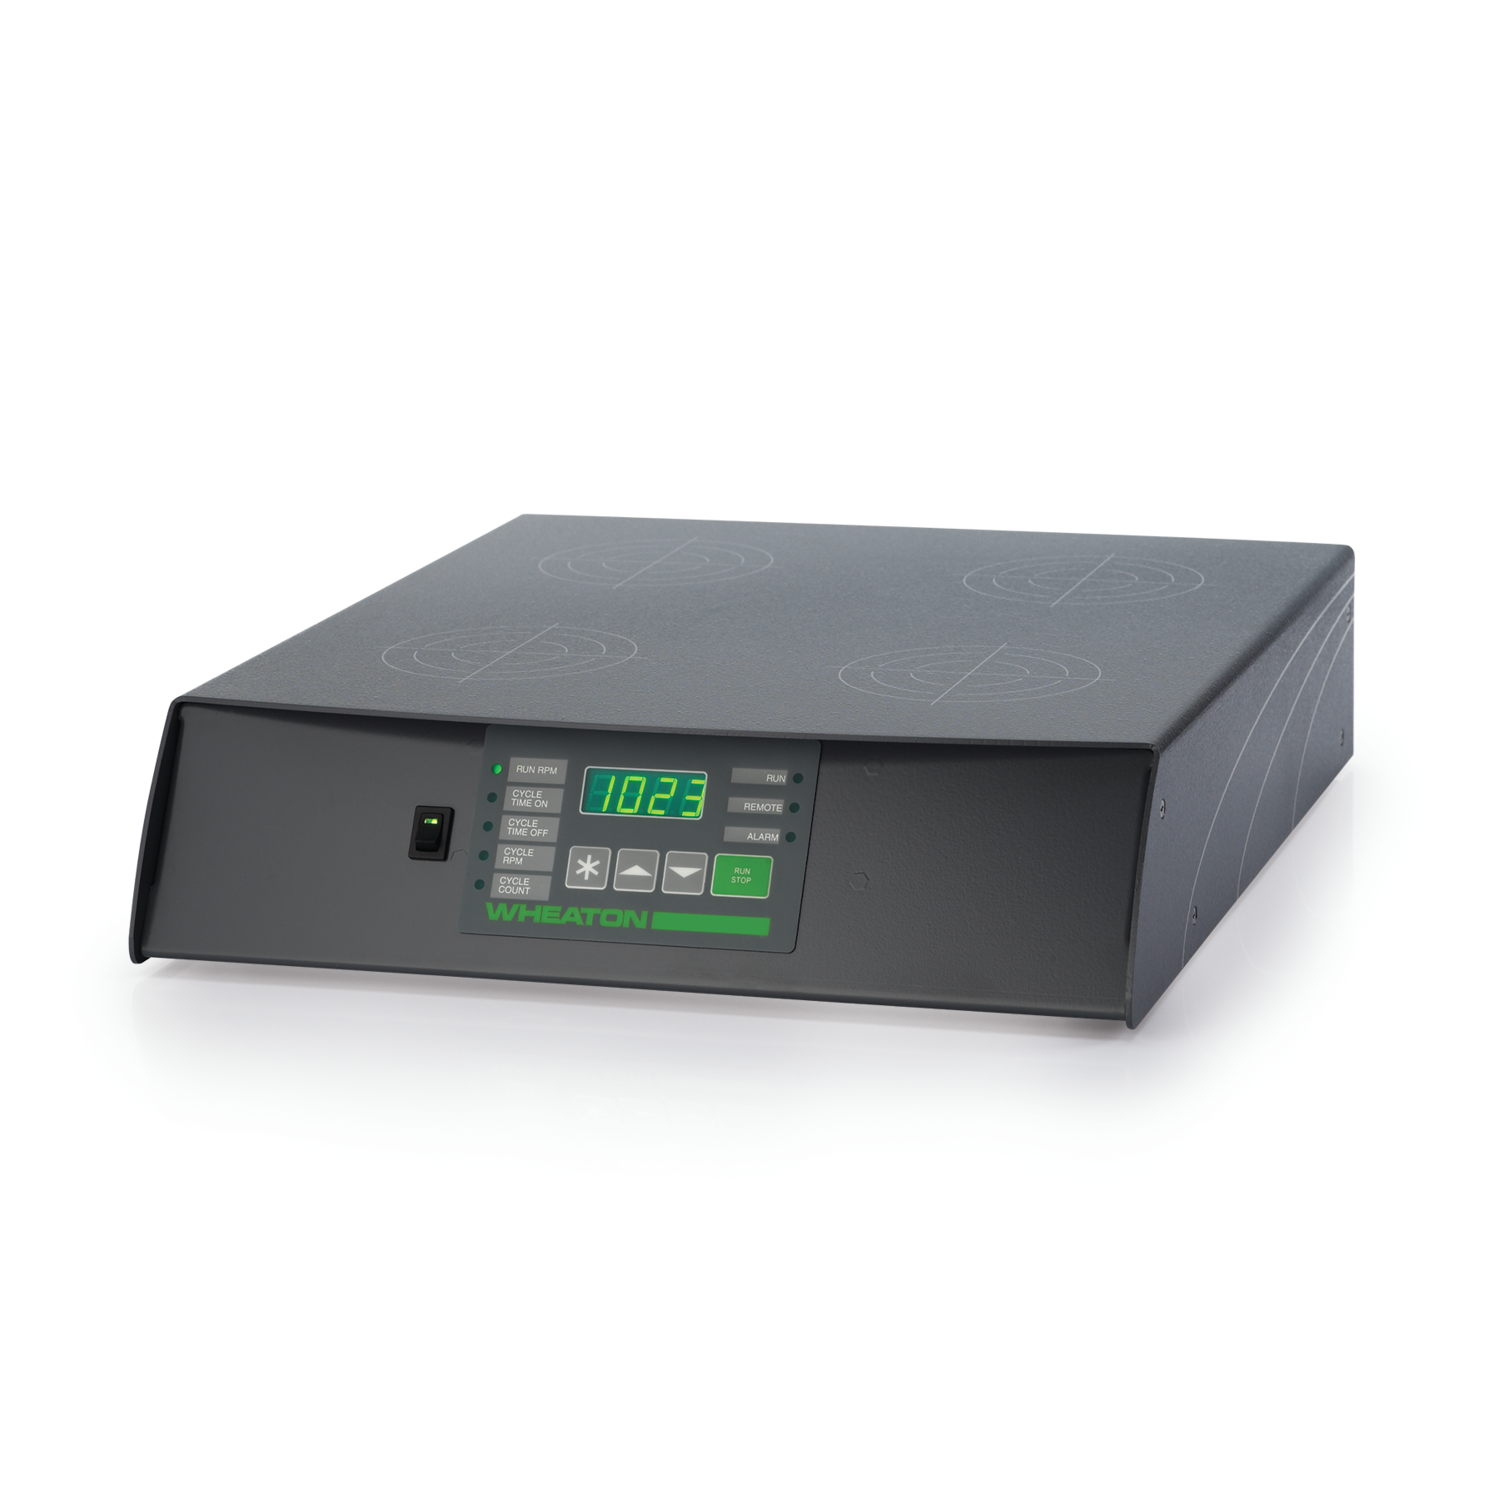 WHEATON® MICRO-STIR® Magnetic Stirrer, 5-200 RPM, Four Place, Switzerland Cord